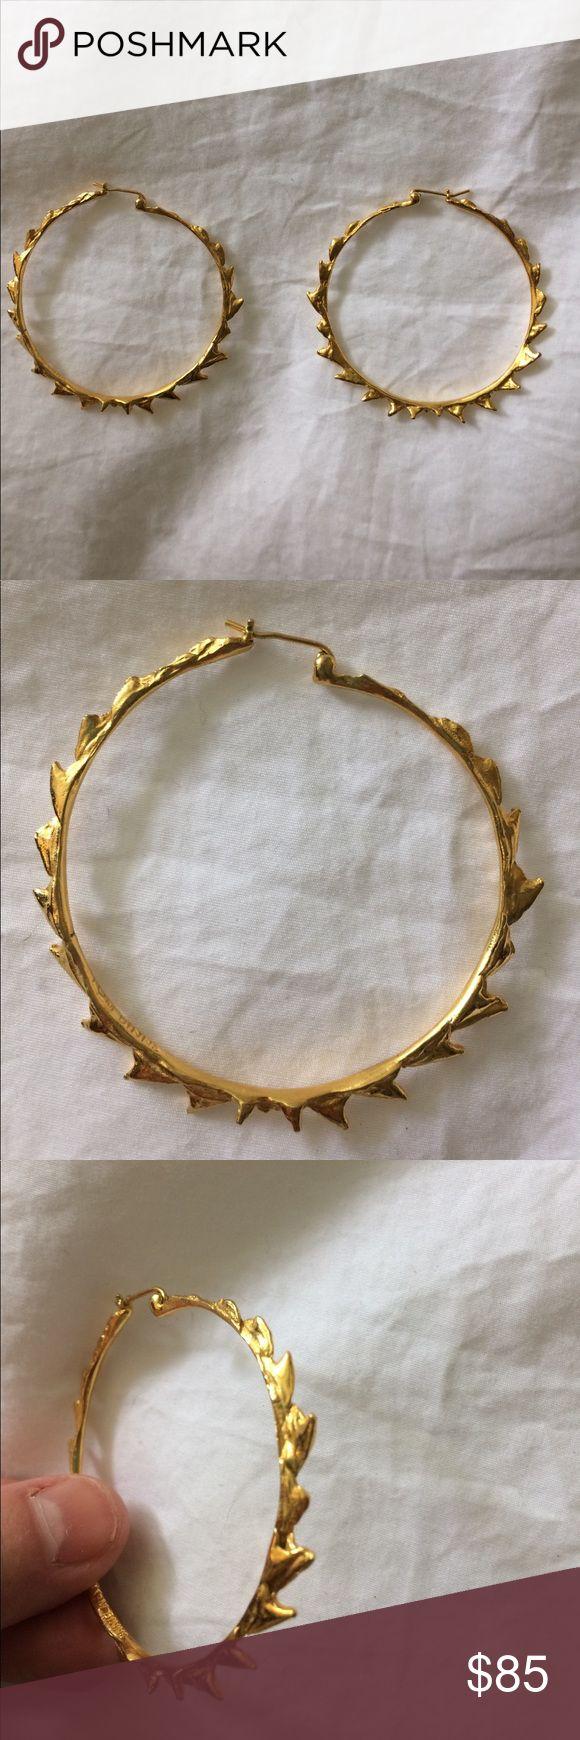 Tom Binns shark tooth hoops Large hoops that look like shark teeth. 24k plated brass. Purchased from Moda Operandi but haven't worn them much. Tom Binns Jewelry Earrings